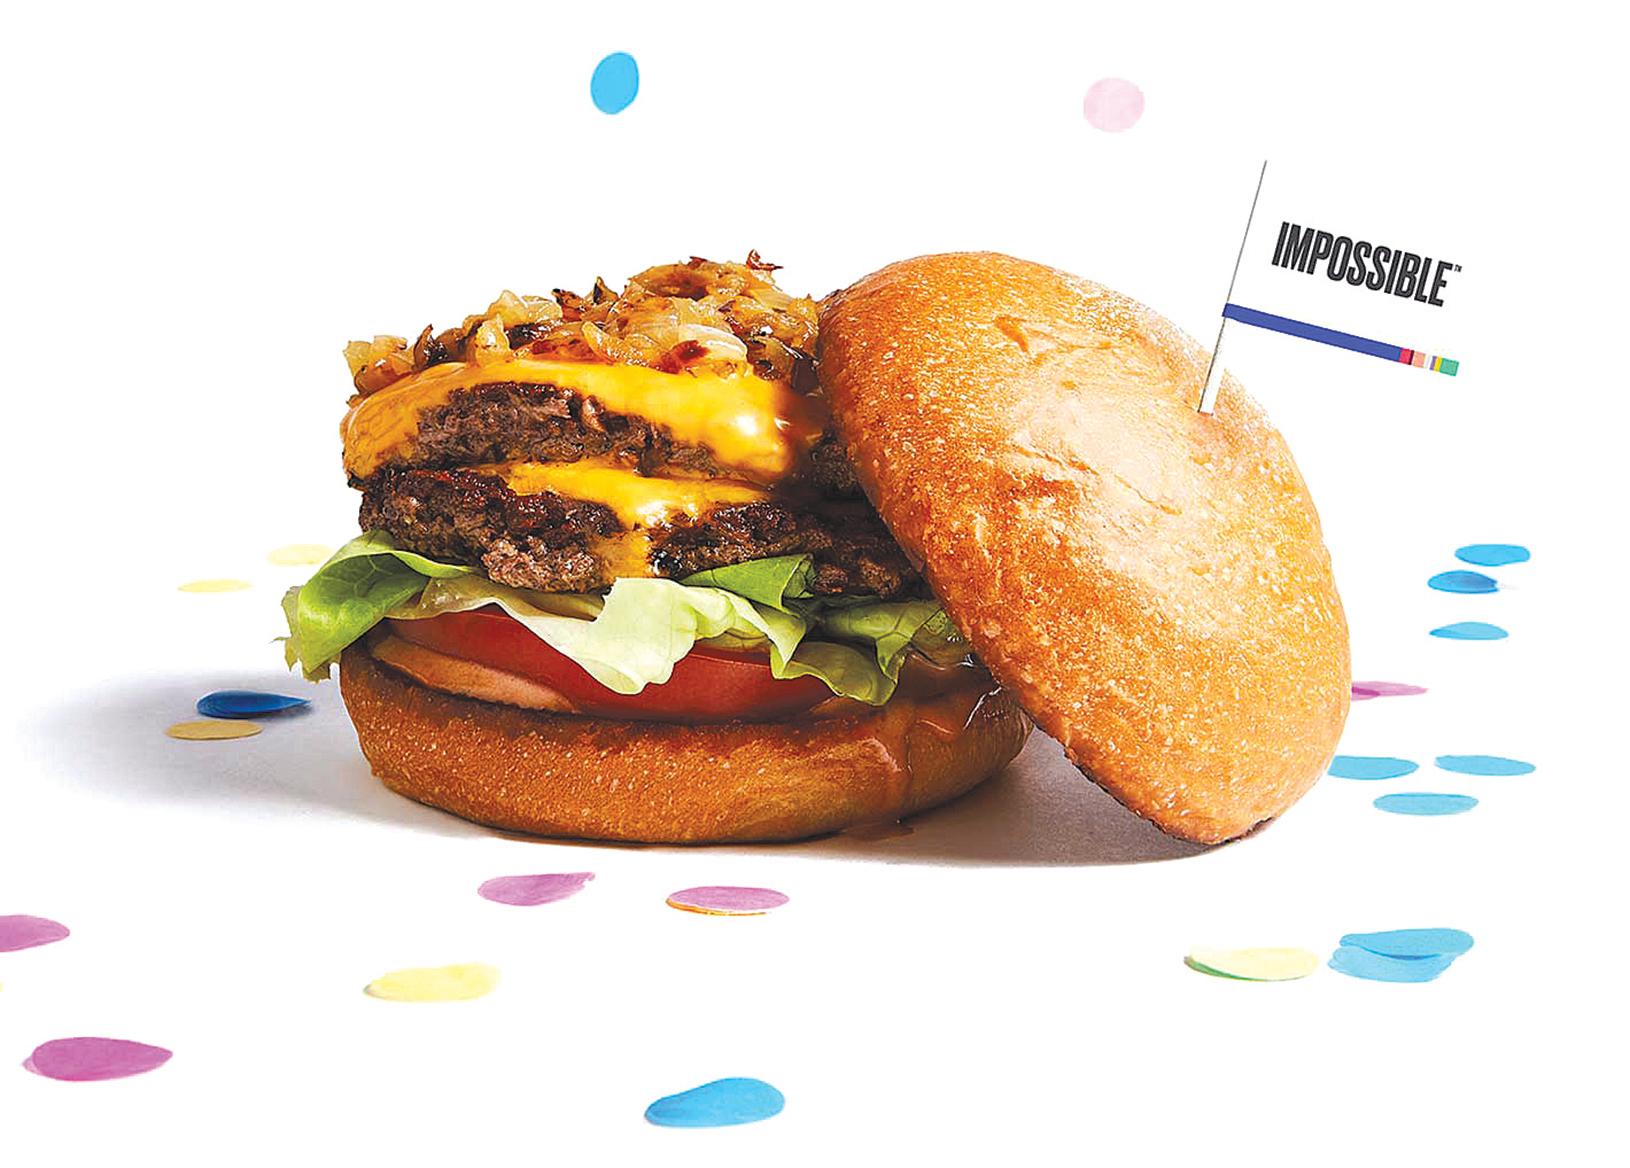 硅谷一家企業推出了全素漢堡產品。(Impossible Foods)